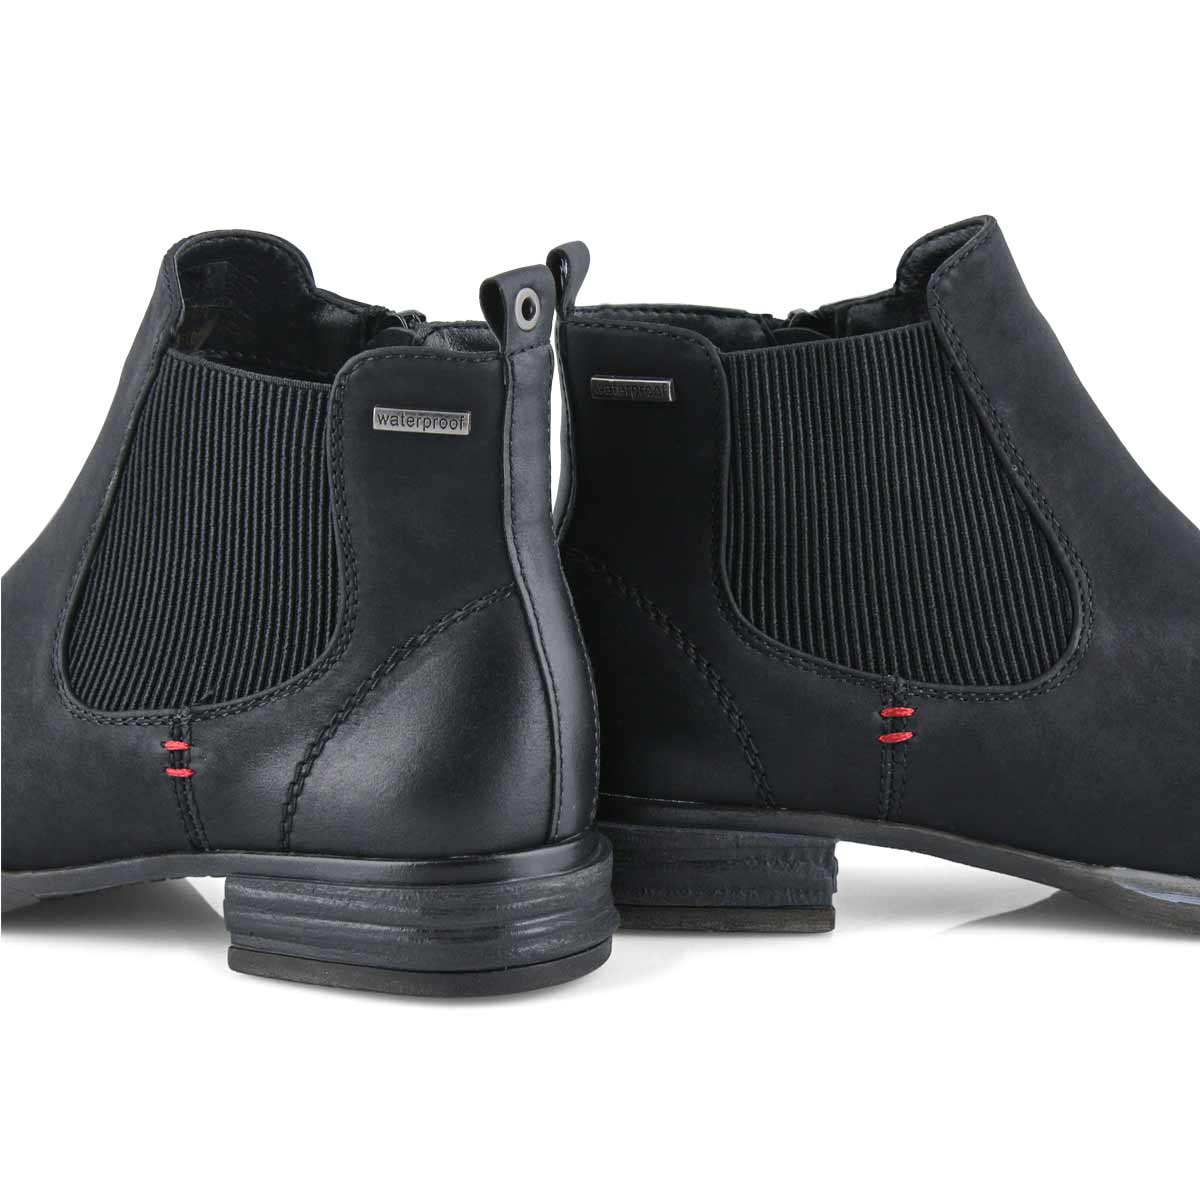 Lds Venus 37 black chelsea boot